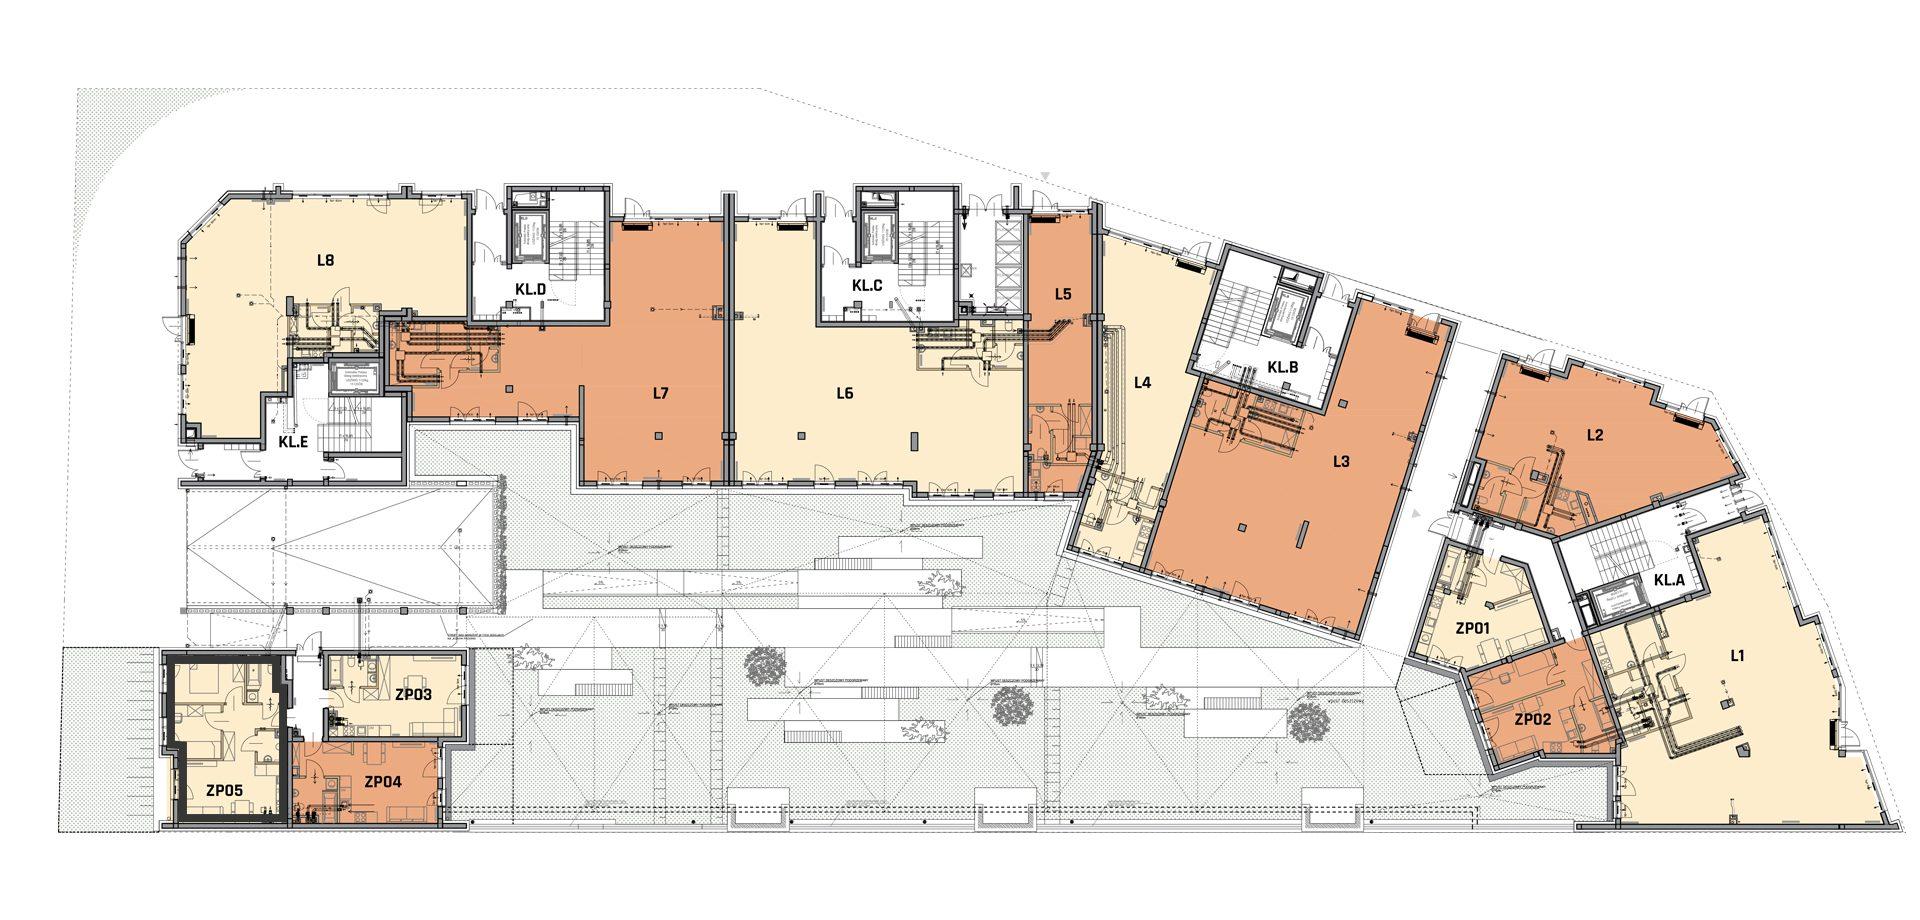 Nowe mieszkanie Kielce | Hill Bud Nova Klonova